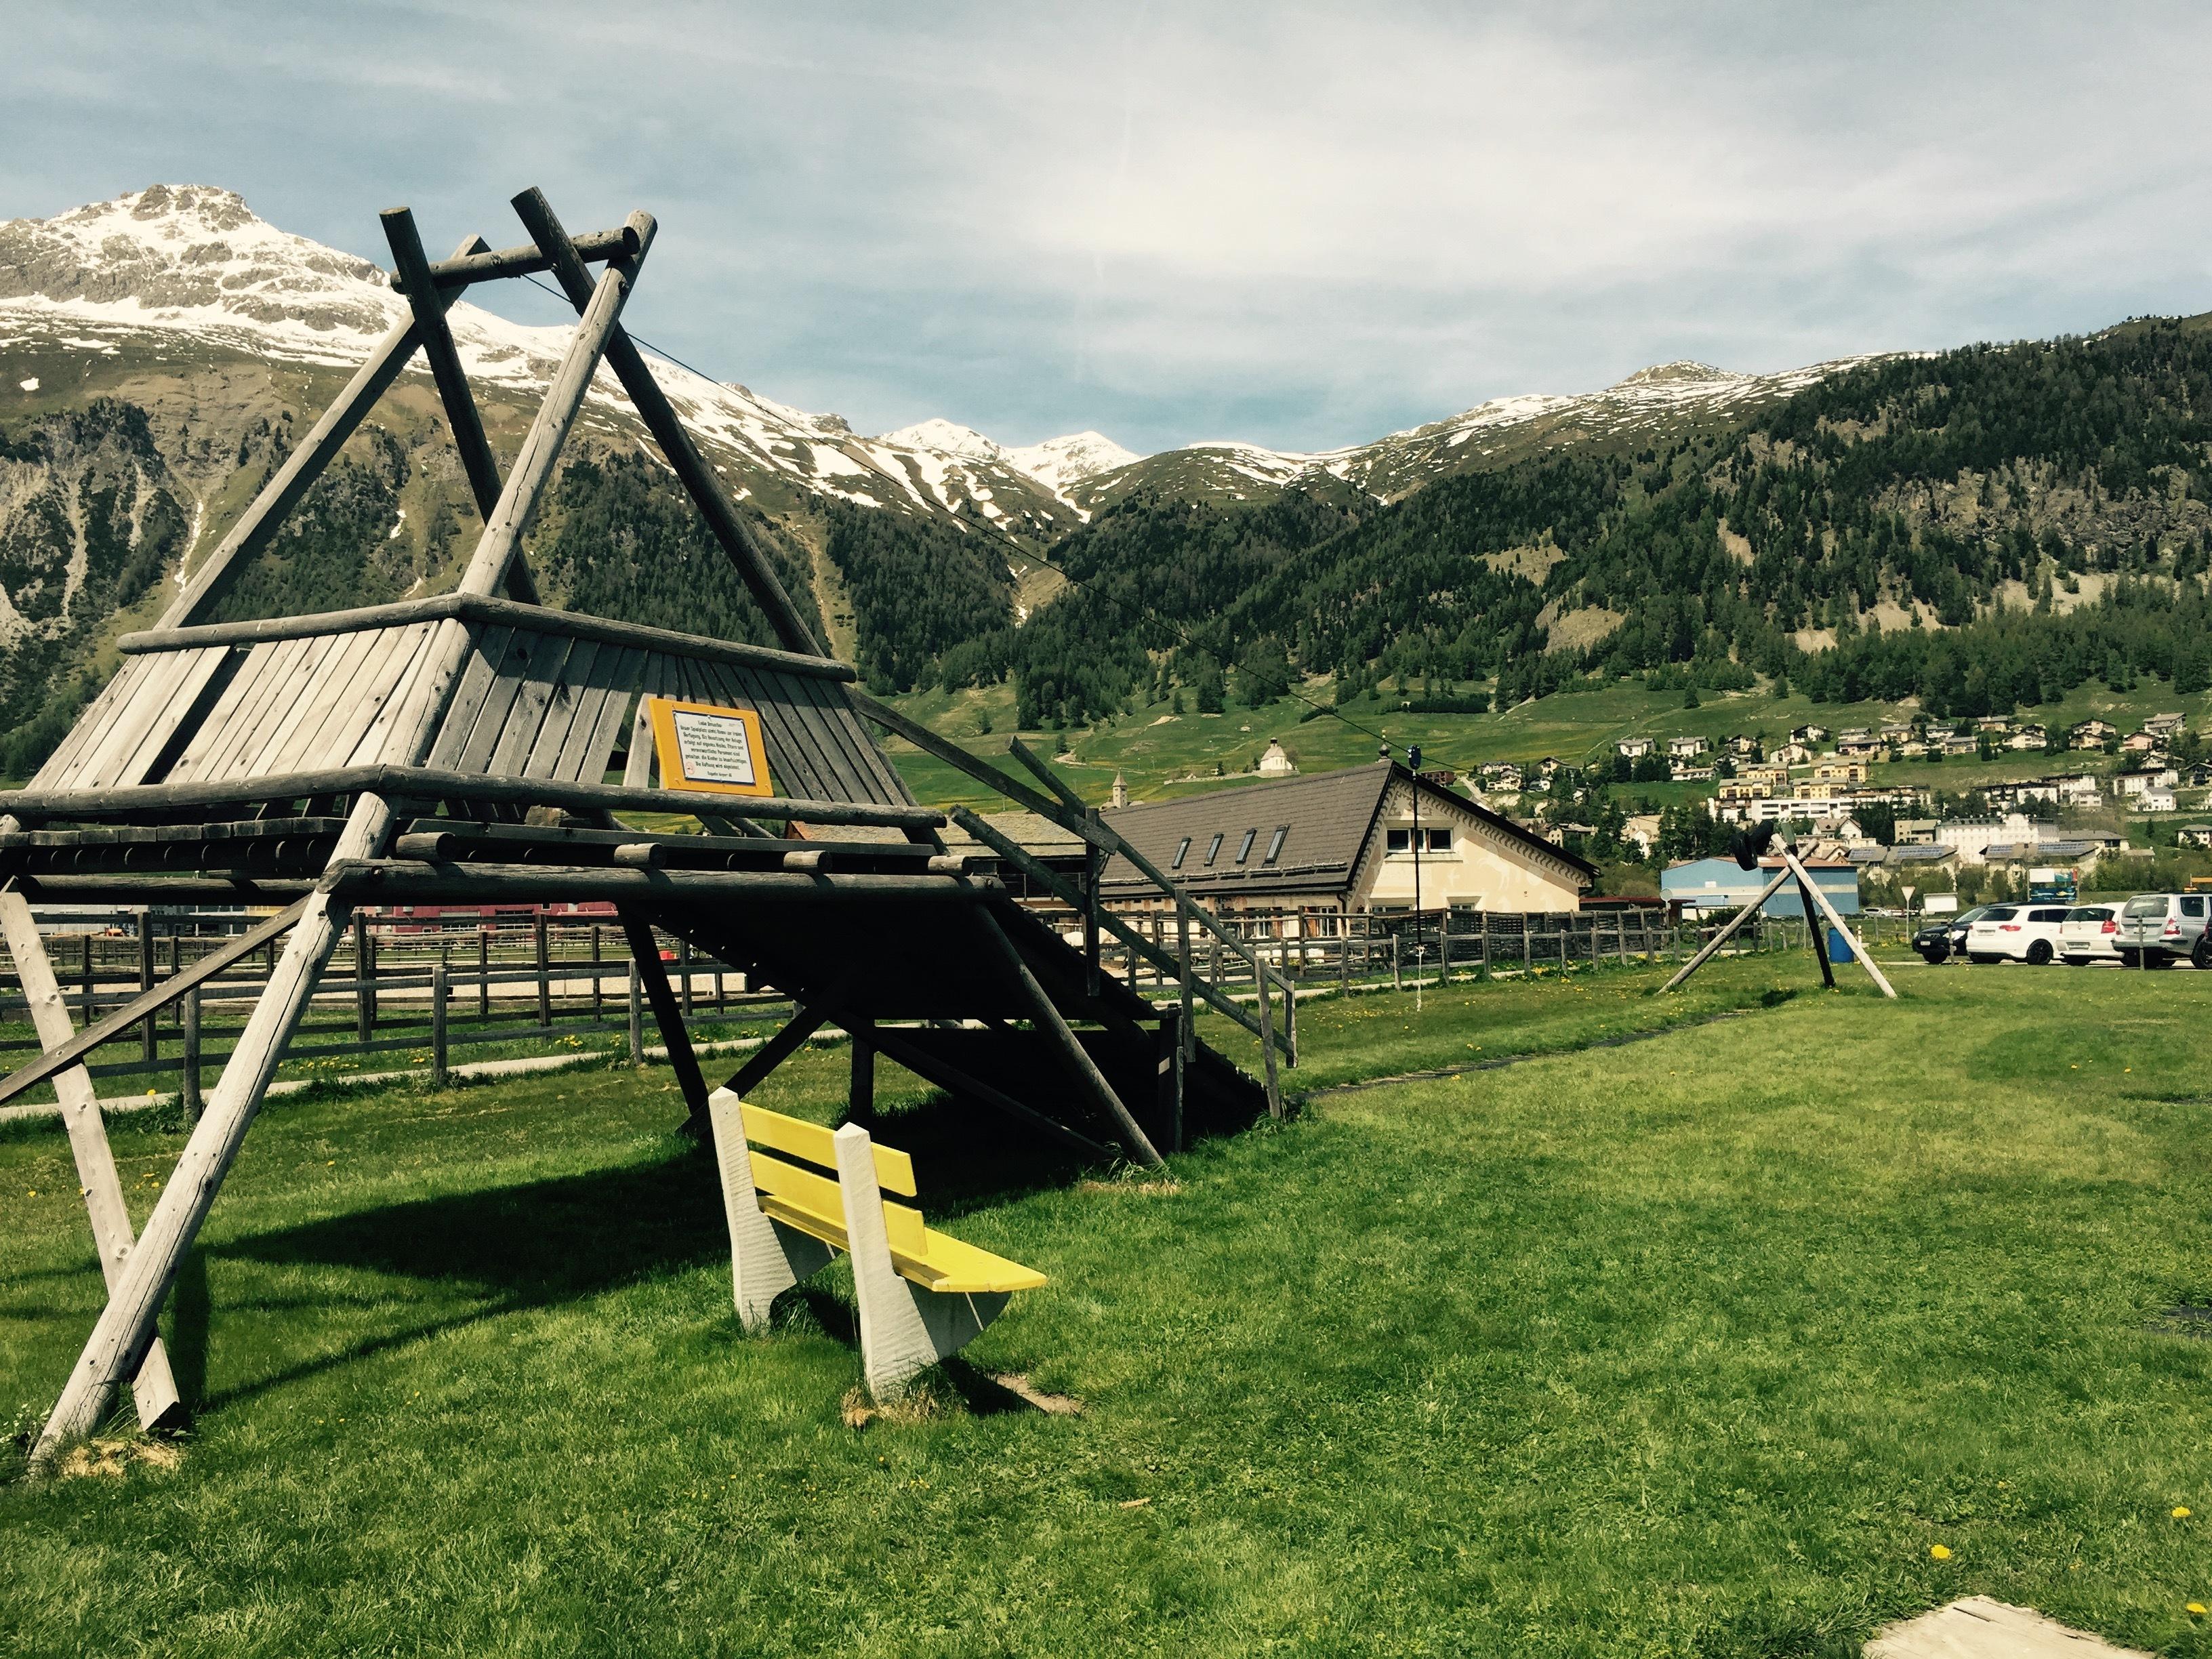 Kinderspielplatz Flugplatz Samedan Slide 1